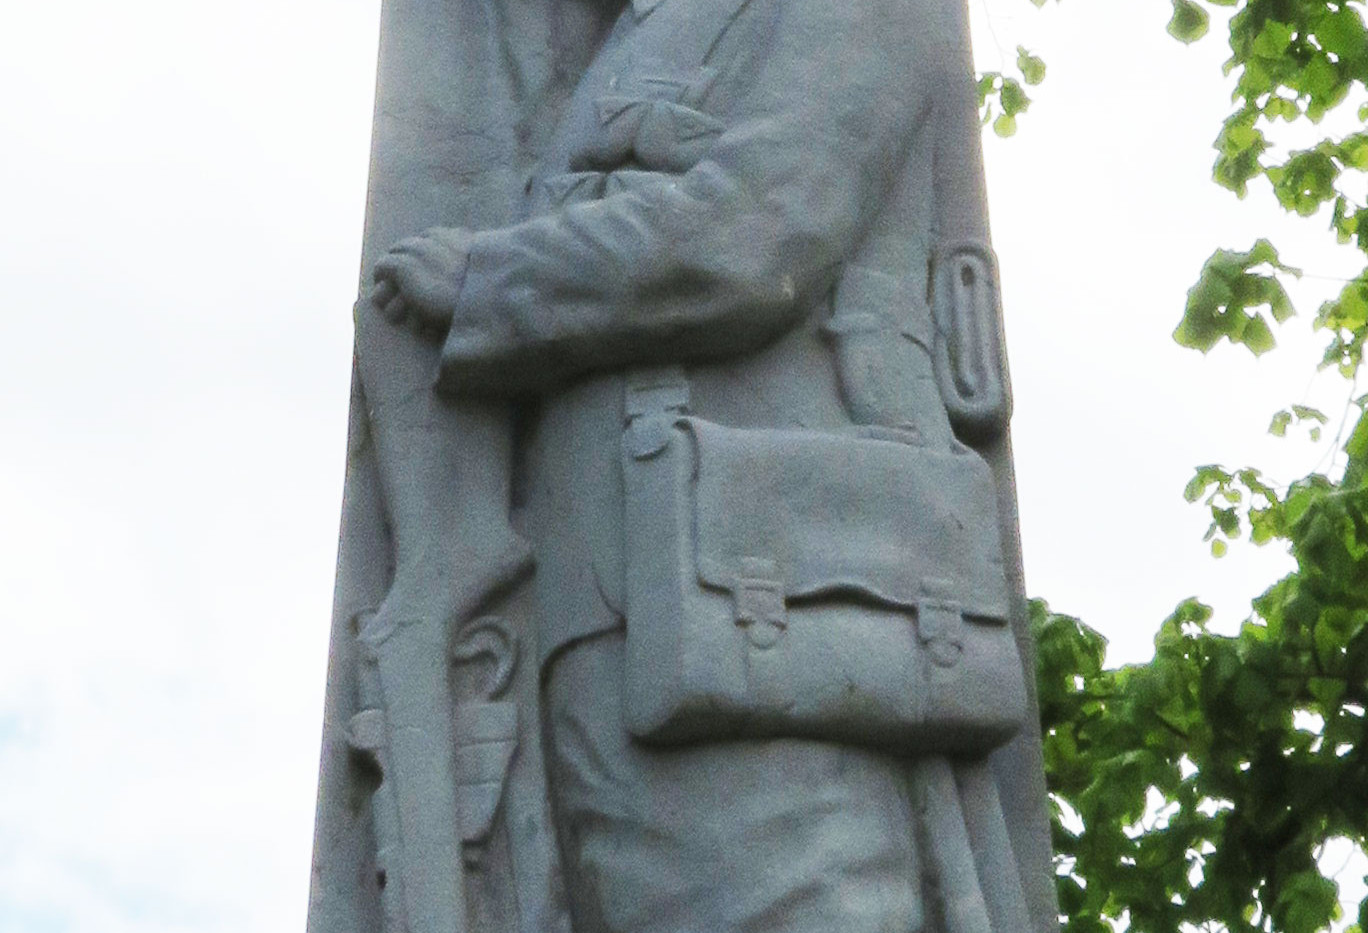 Cork-memorial-sculpture2.jpg